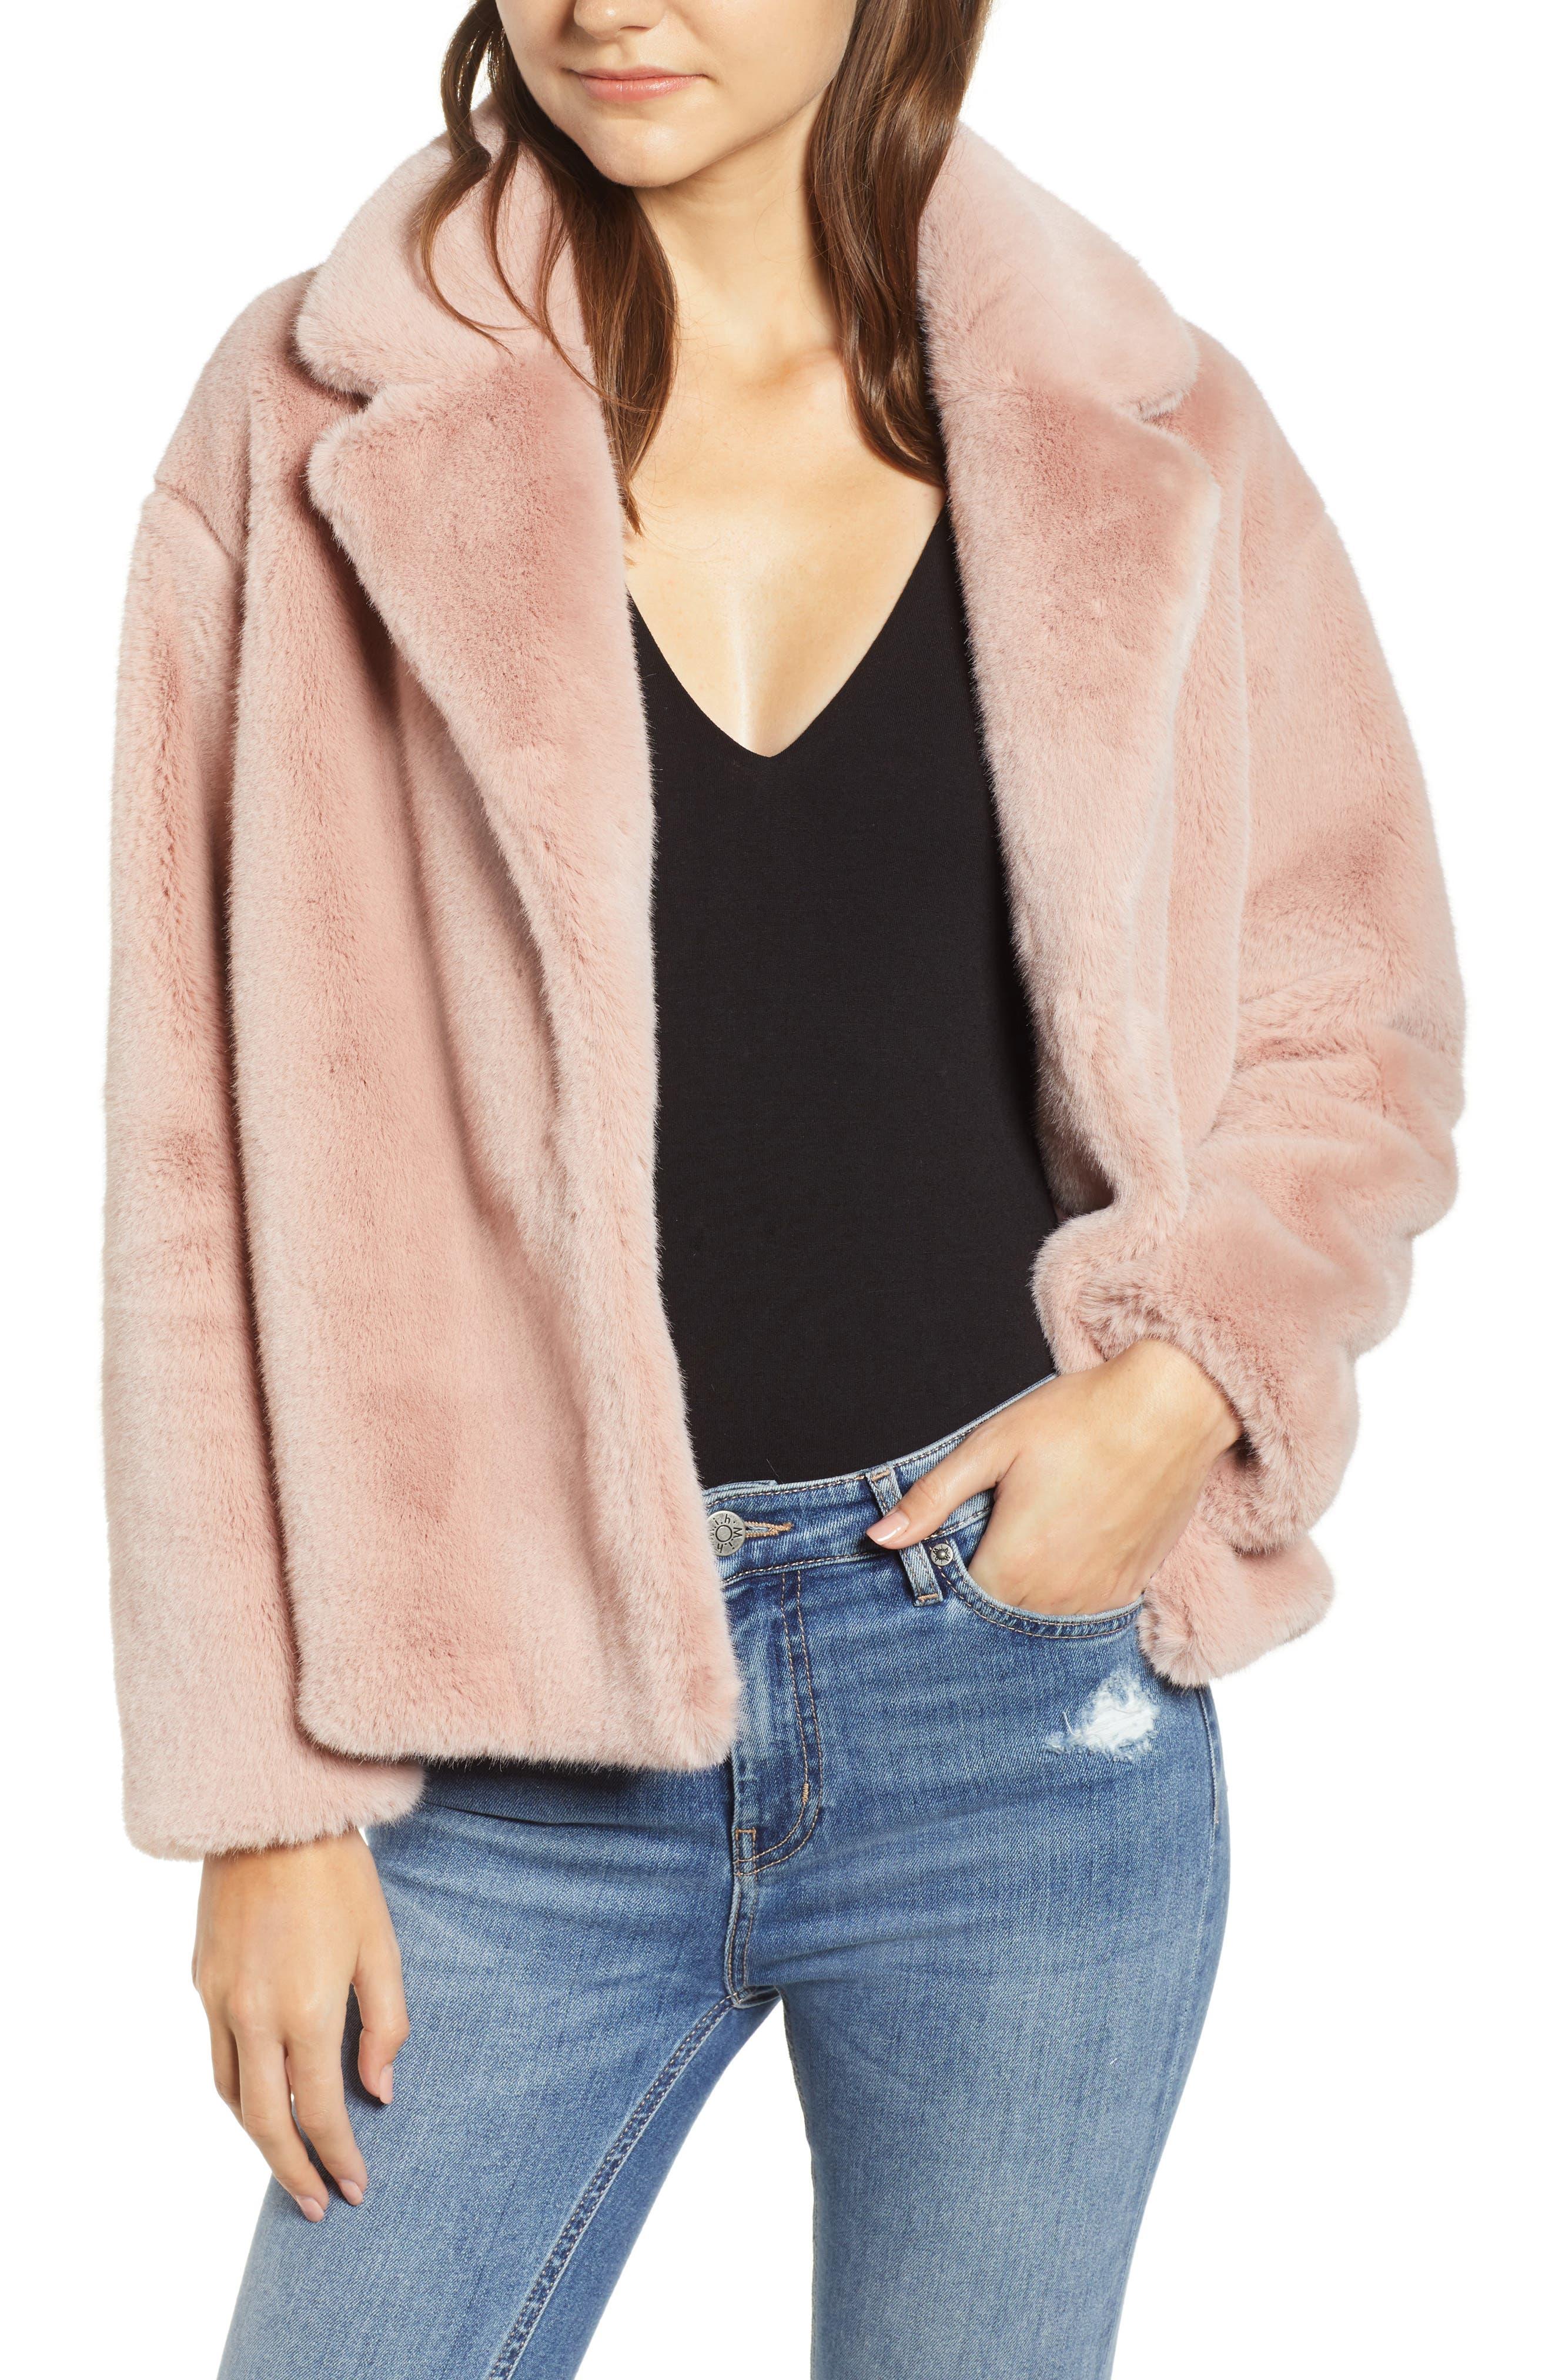 HEARTLOOM Luna Faux Fur Jacket in Mauve